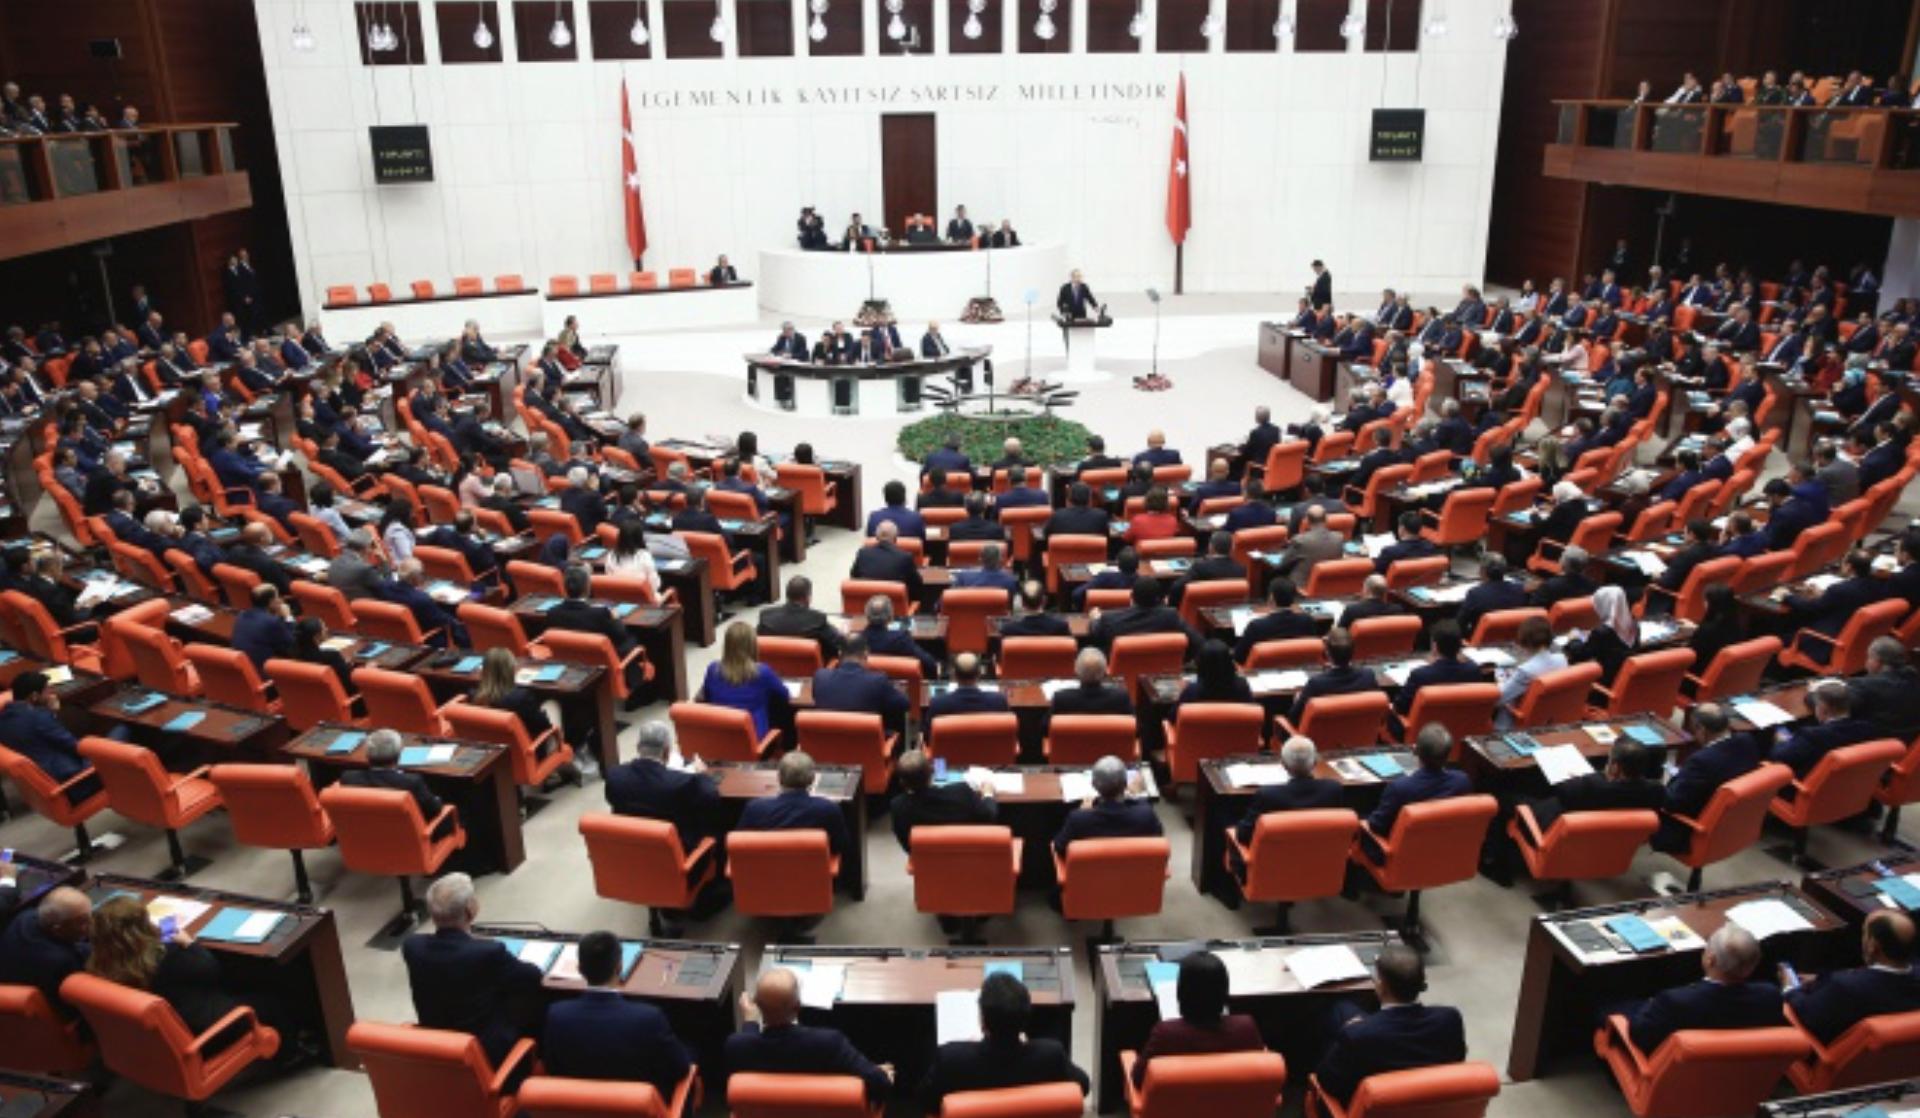 Turska: Stejt Department uputio apel u vezi HDP i poslanika Gergerlioğlua